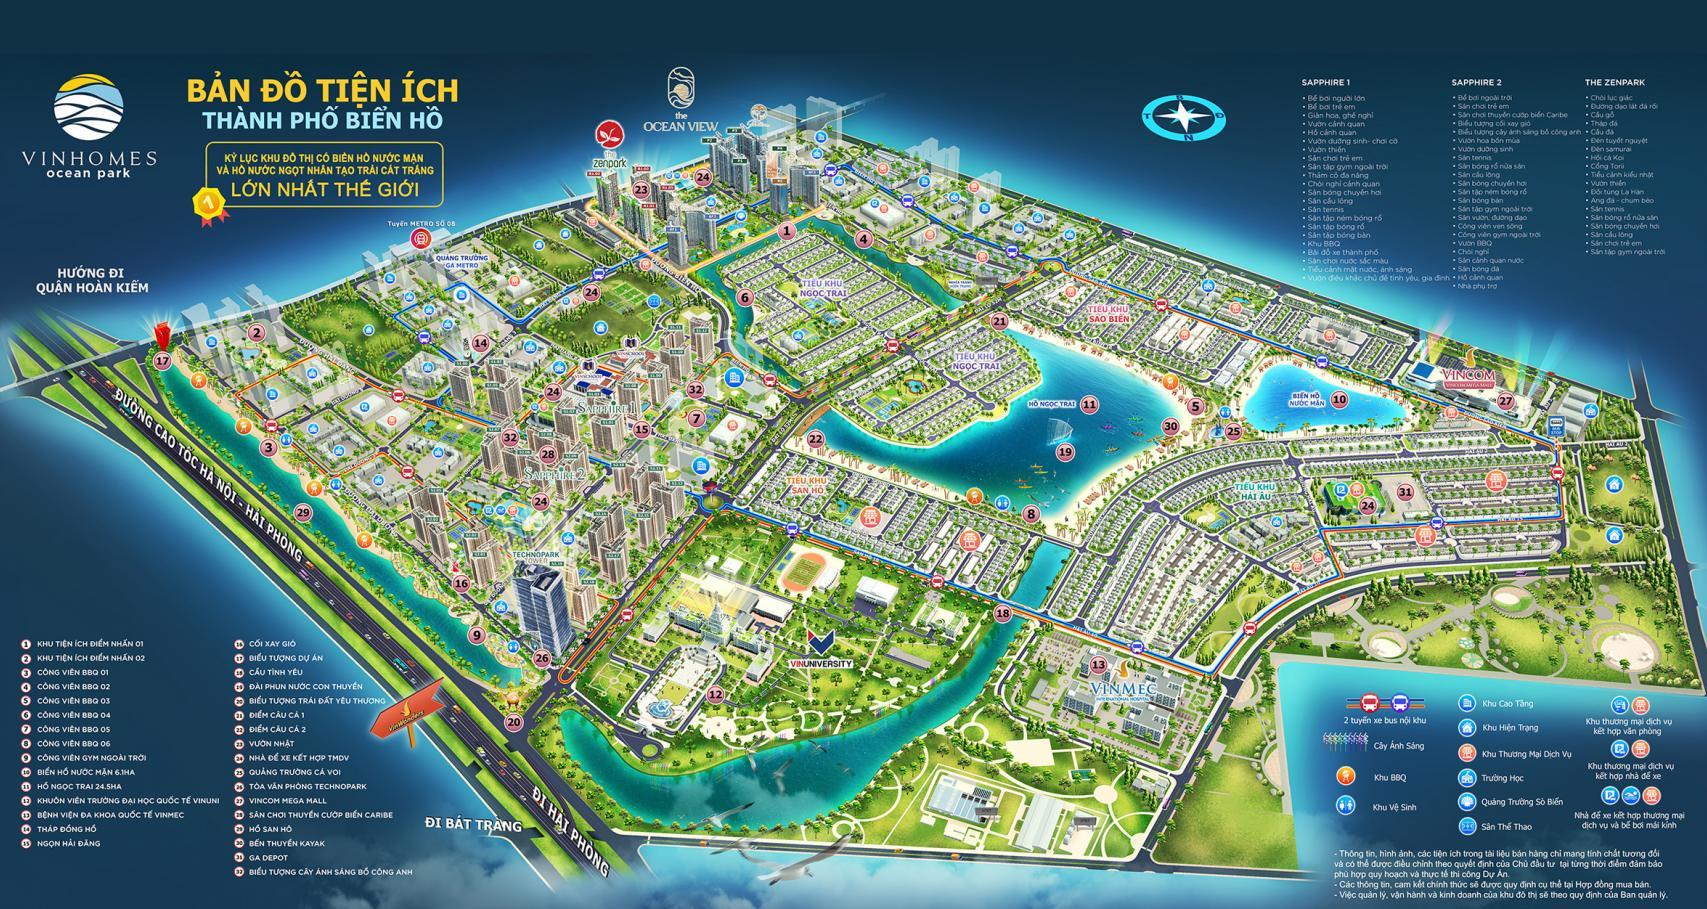 Dự án Vinhomes Ocean Park